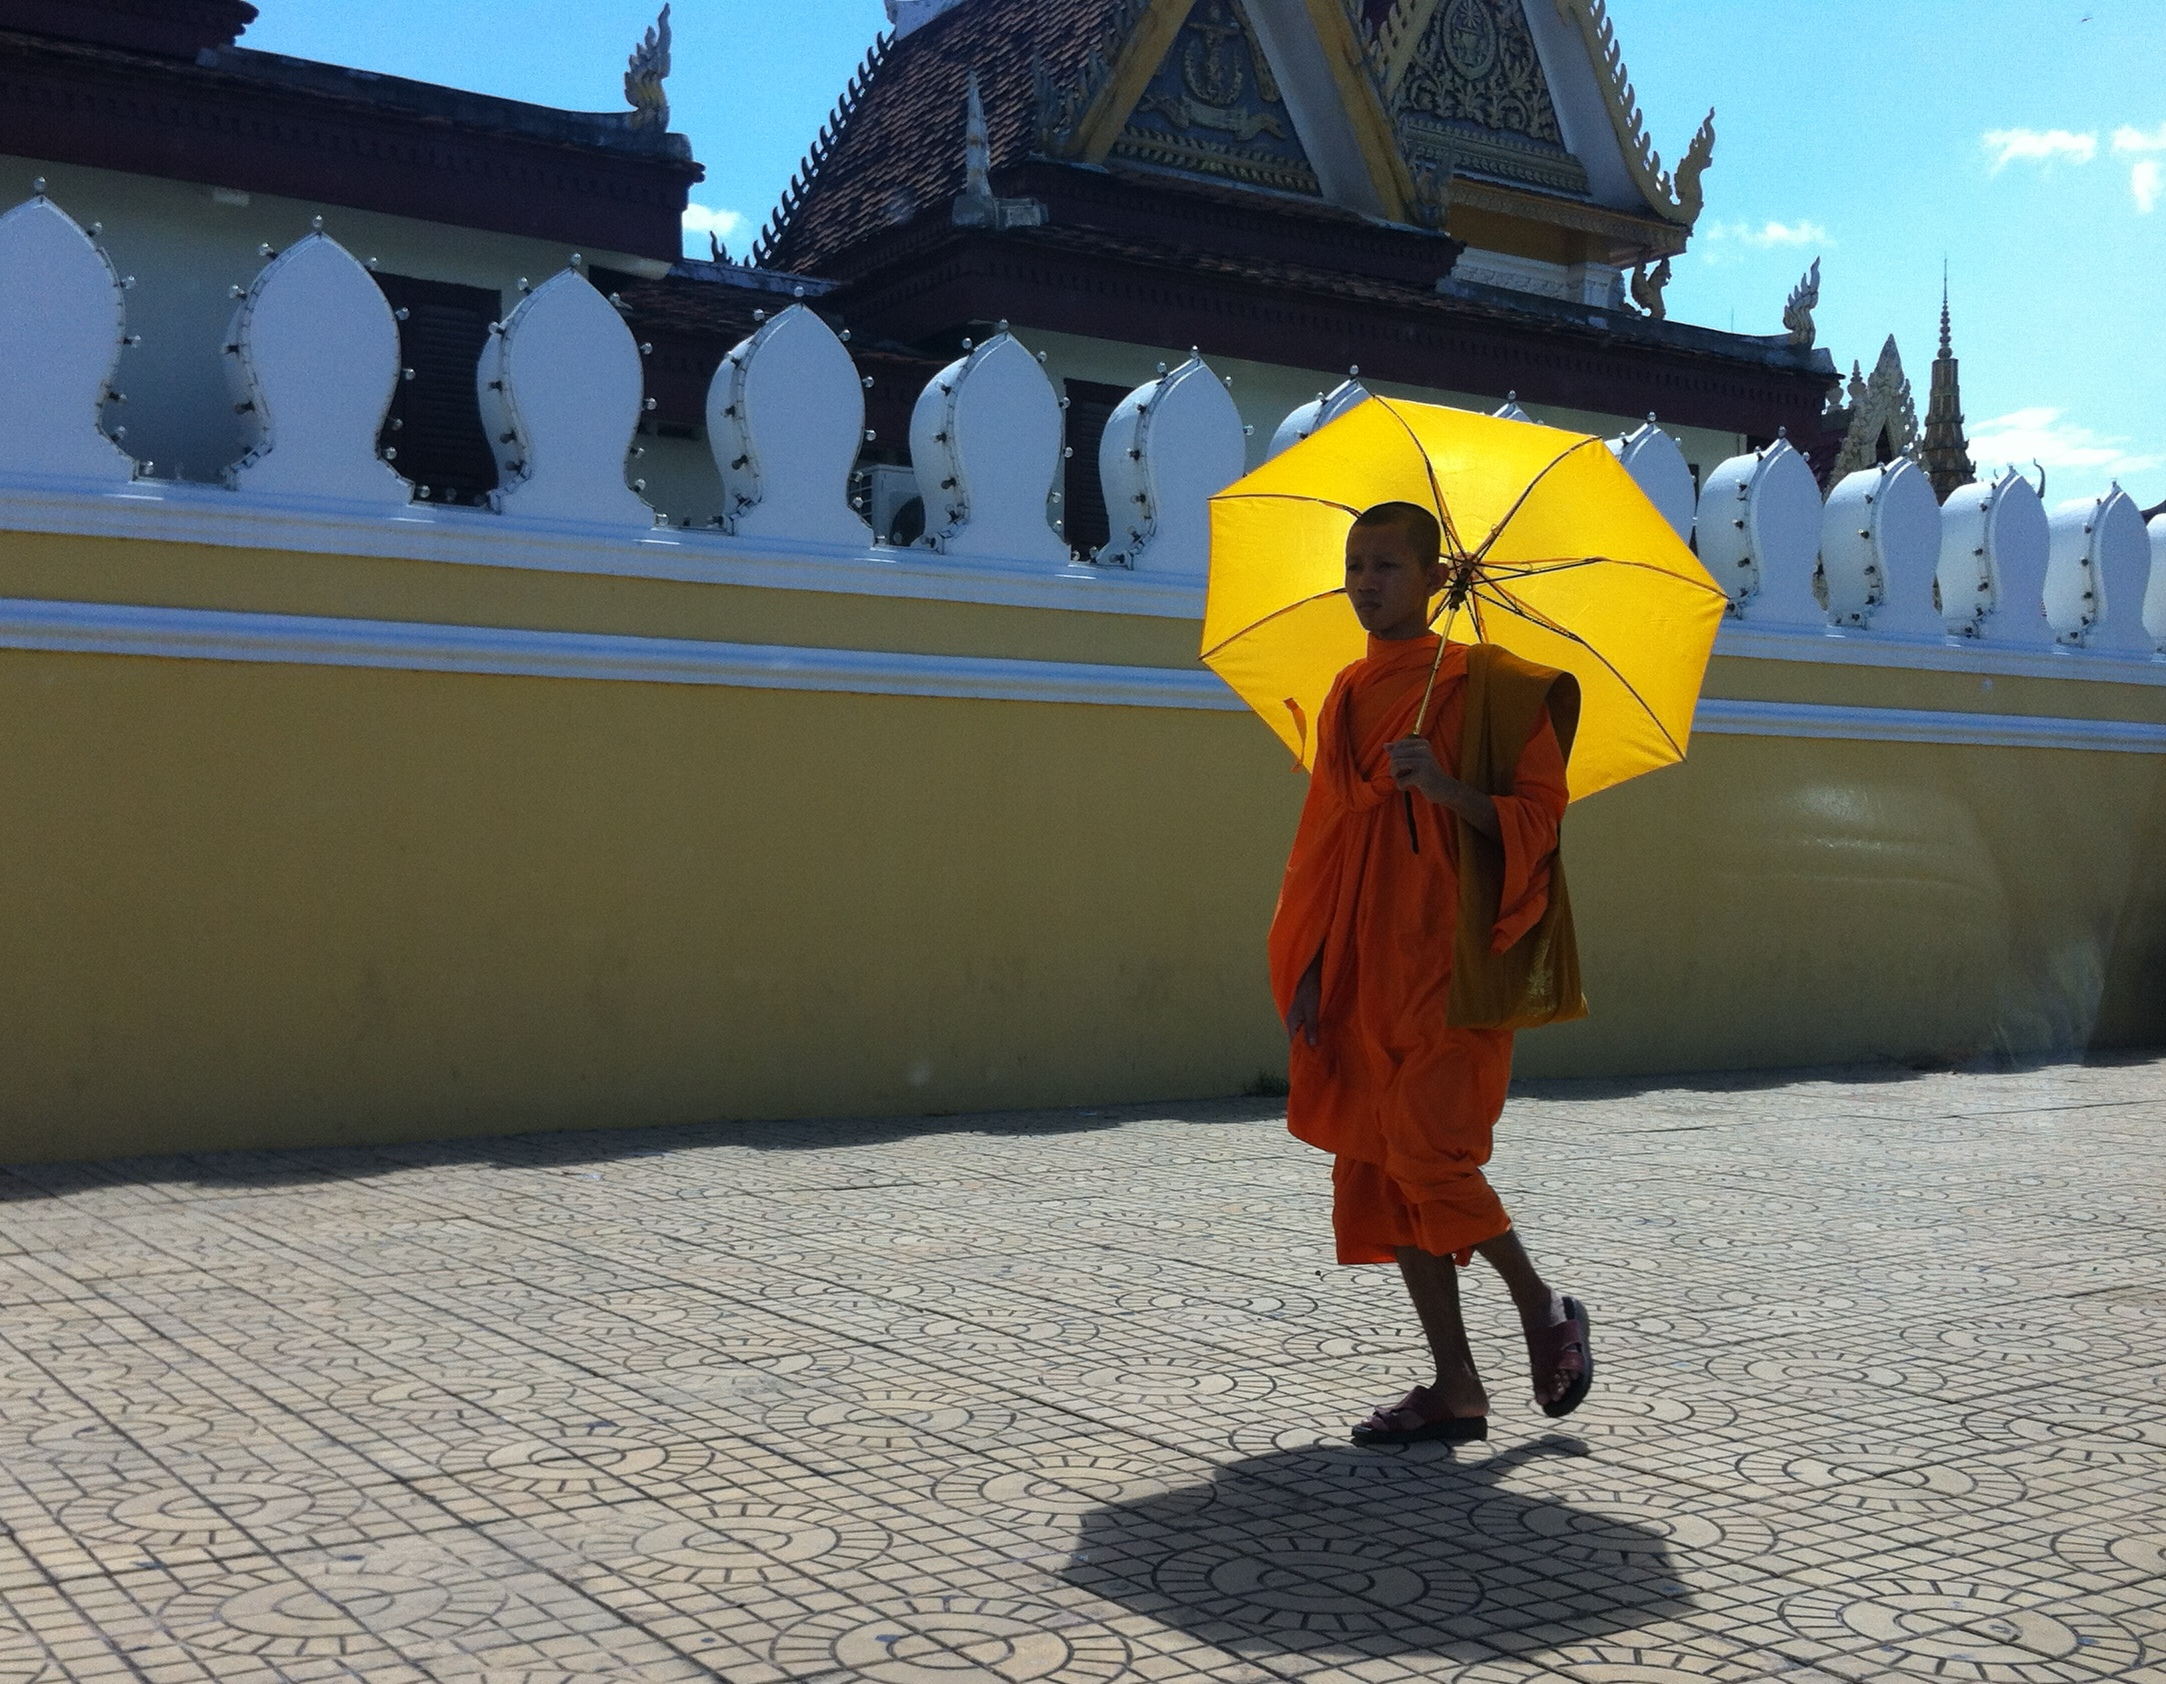 Cambodia - Phnom Penh city and people - Junen 2012 013.JPG